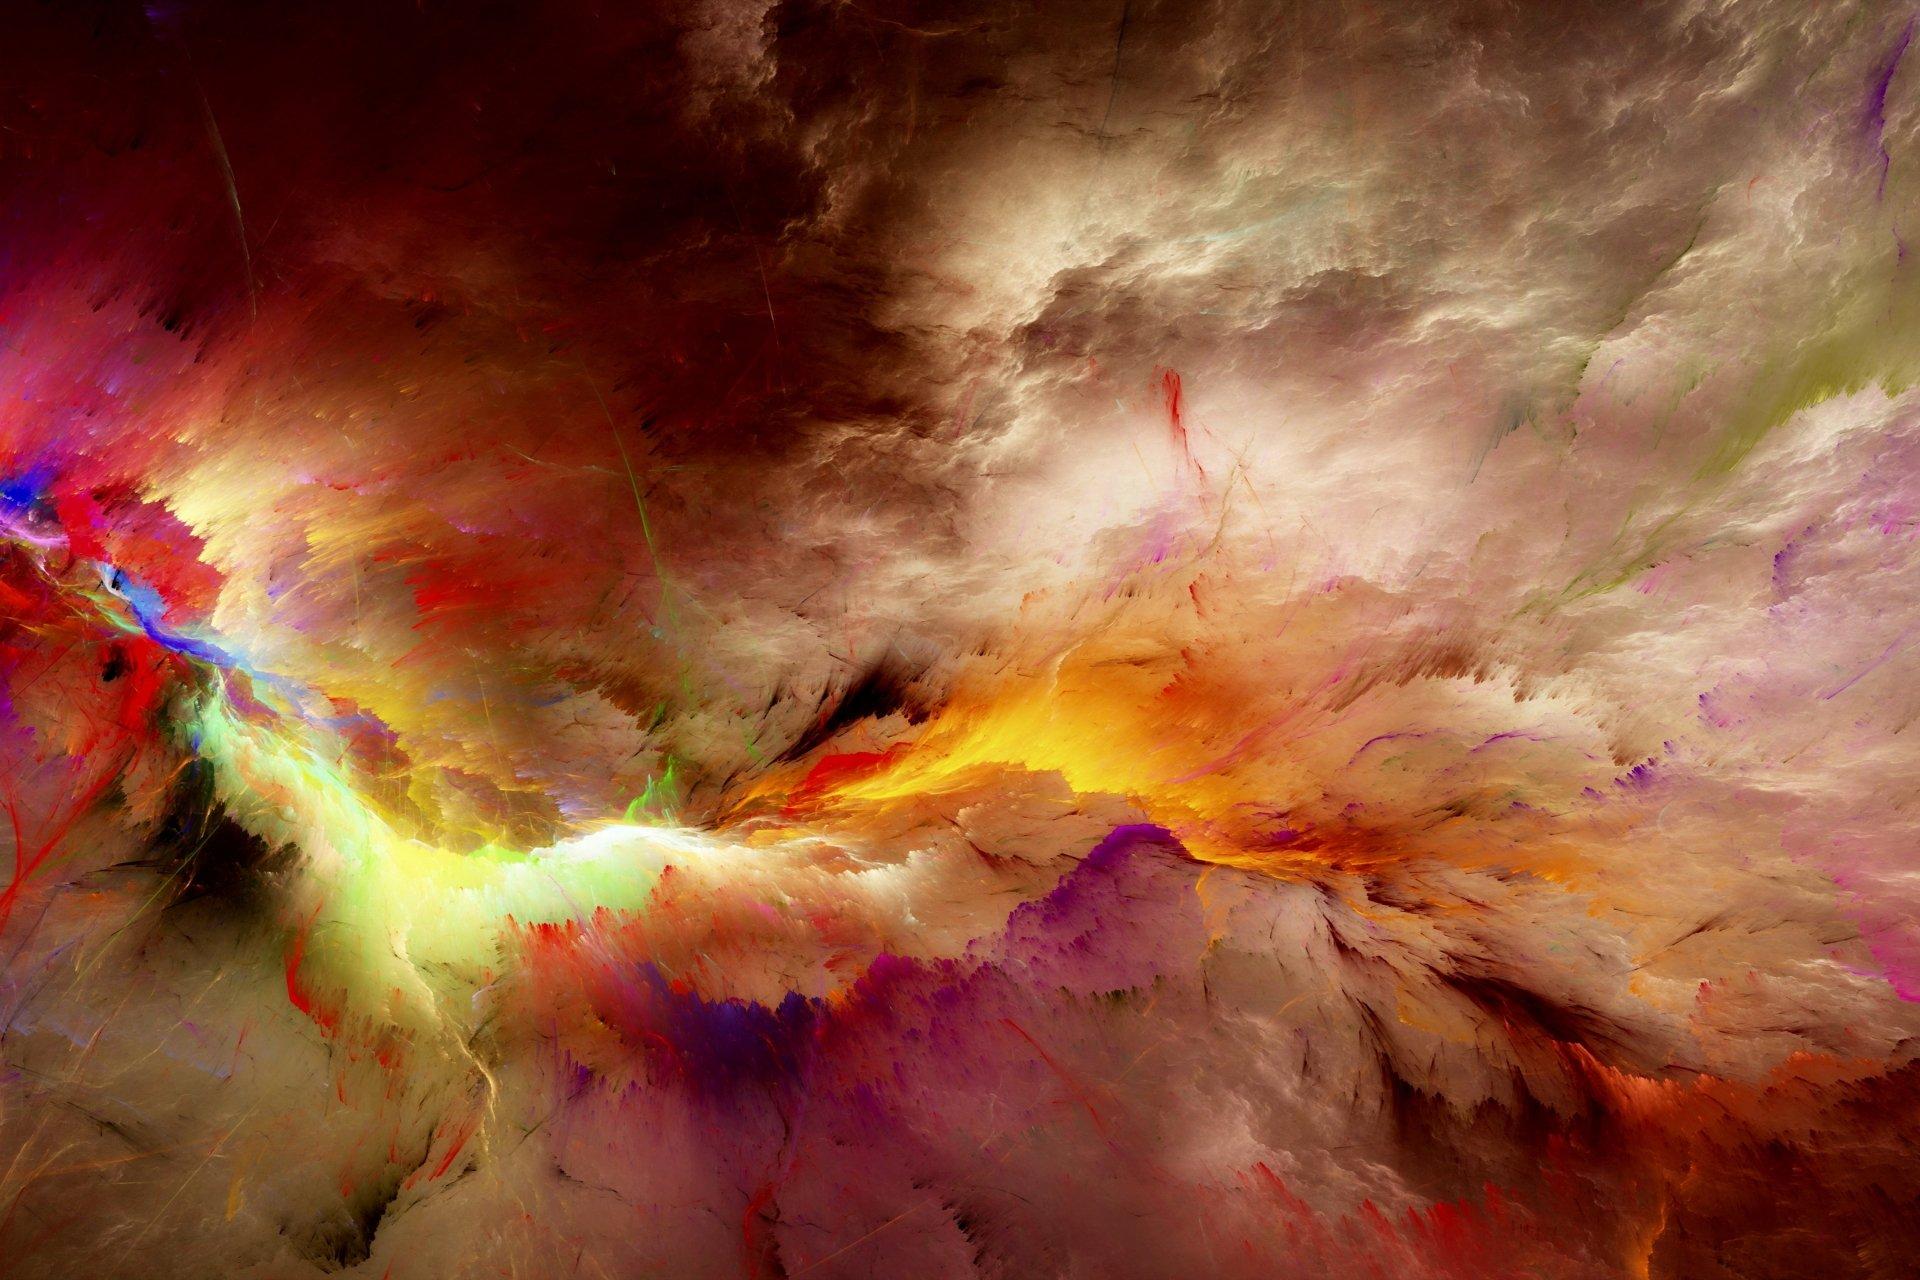 Colorful Cloud Abstract 5k Retina Ultra HD Wallpaper